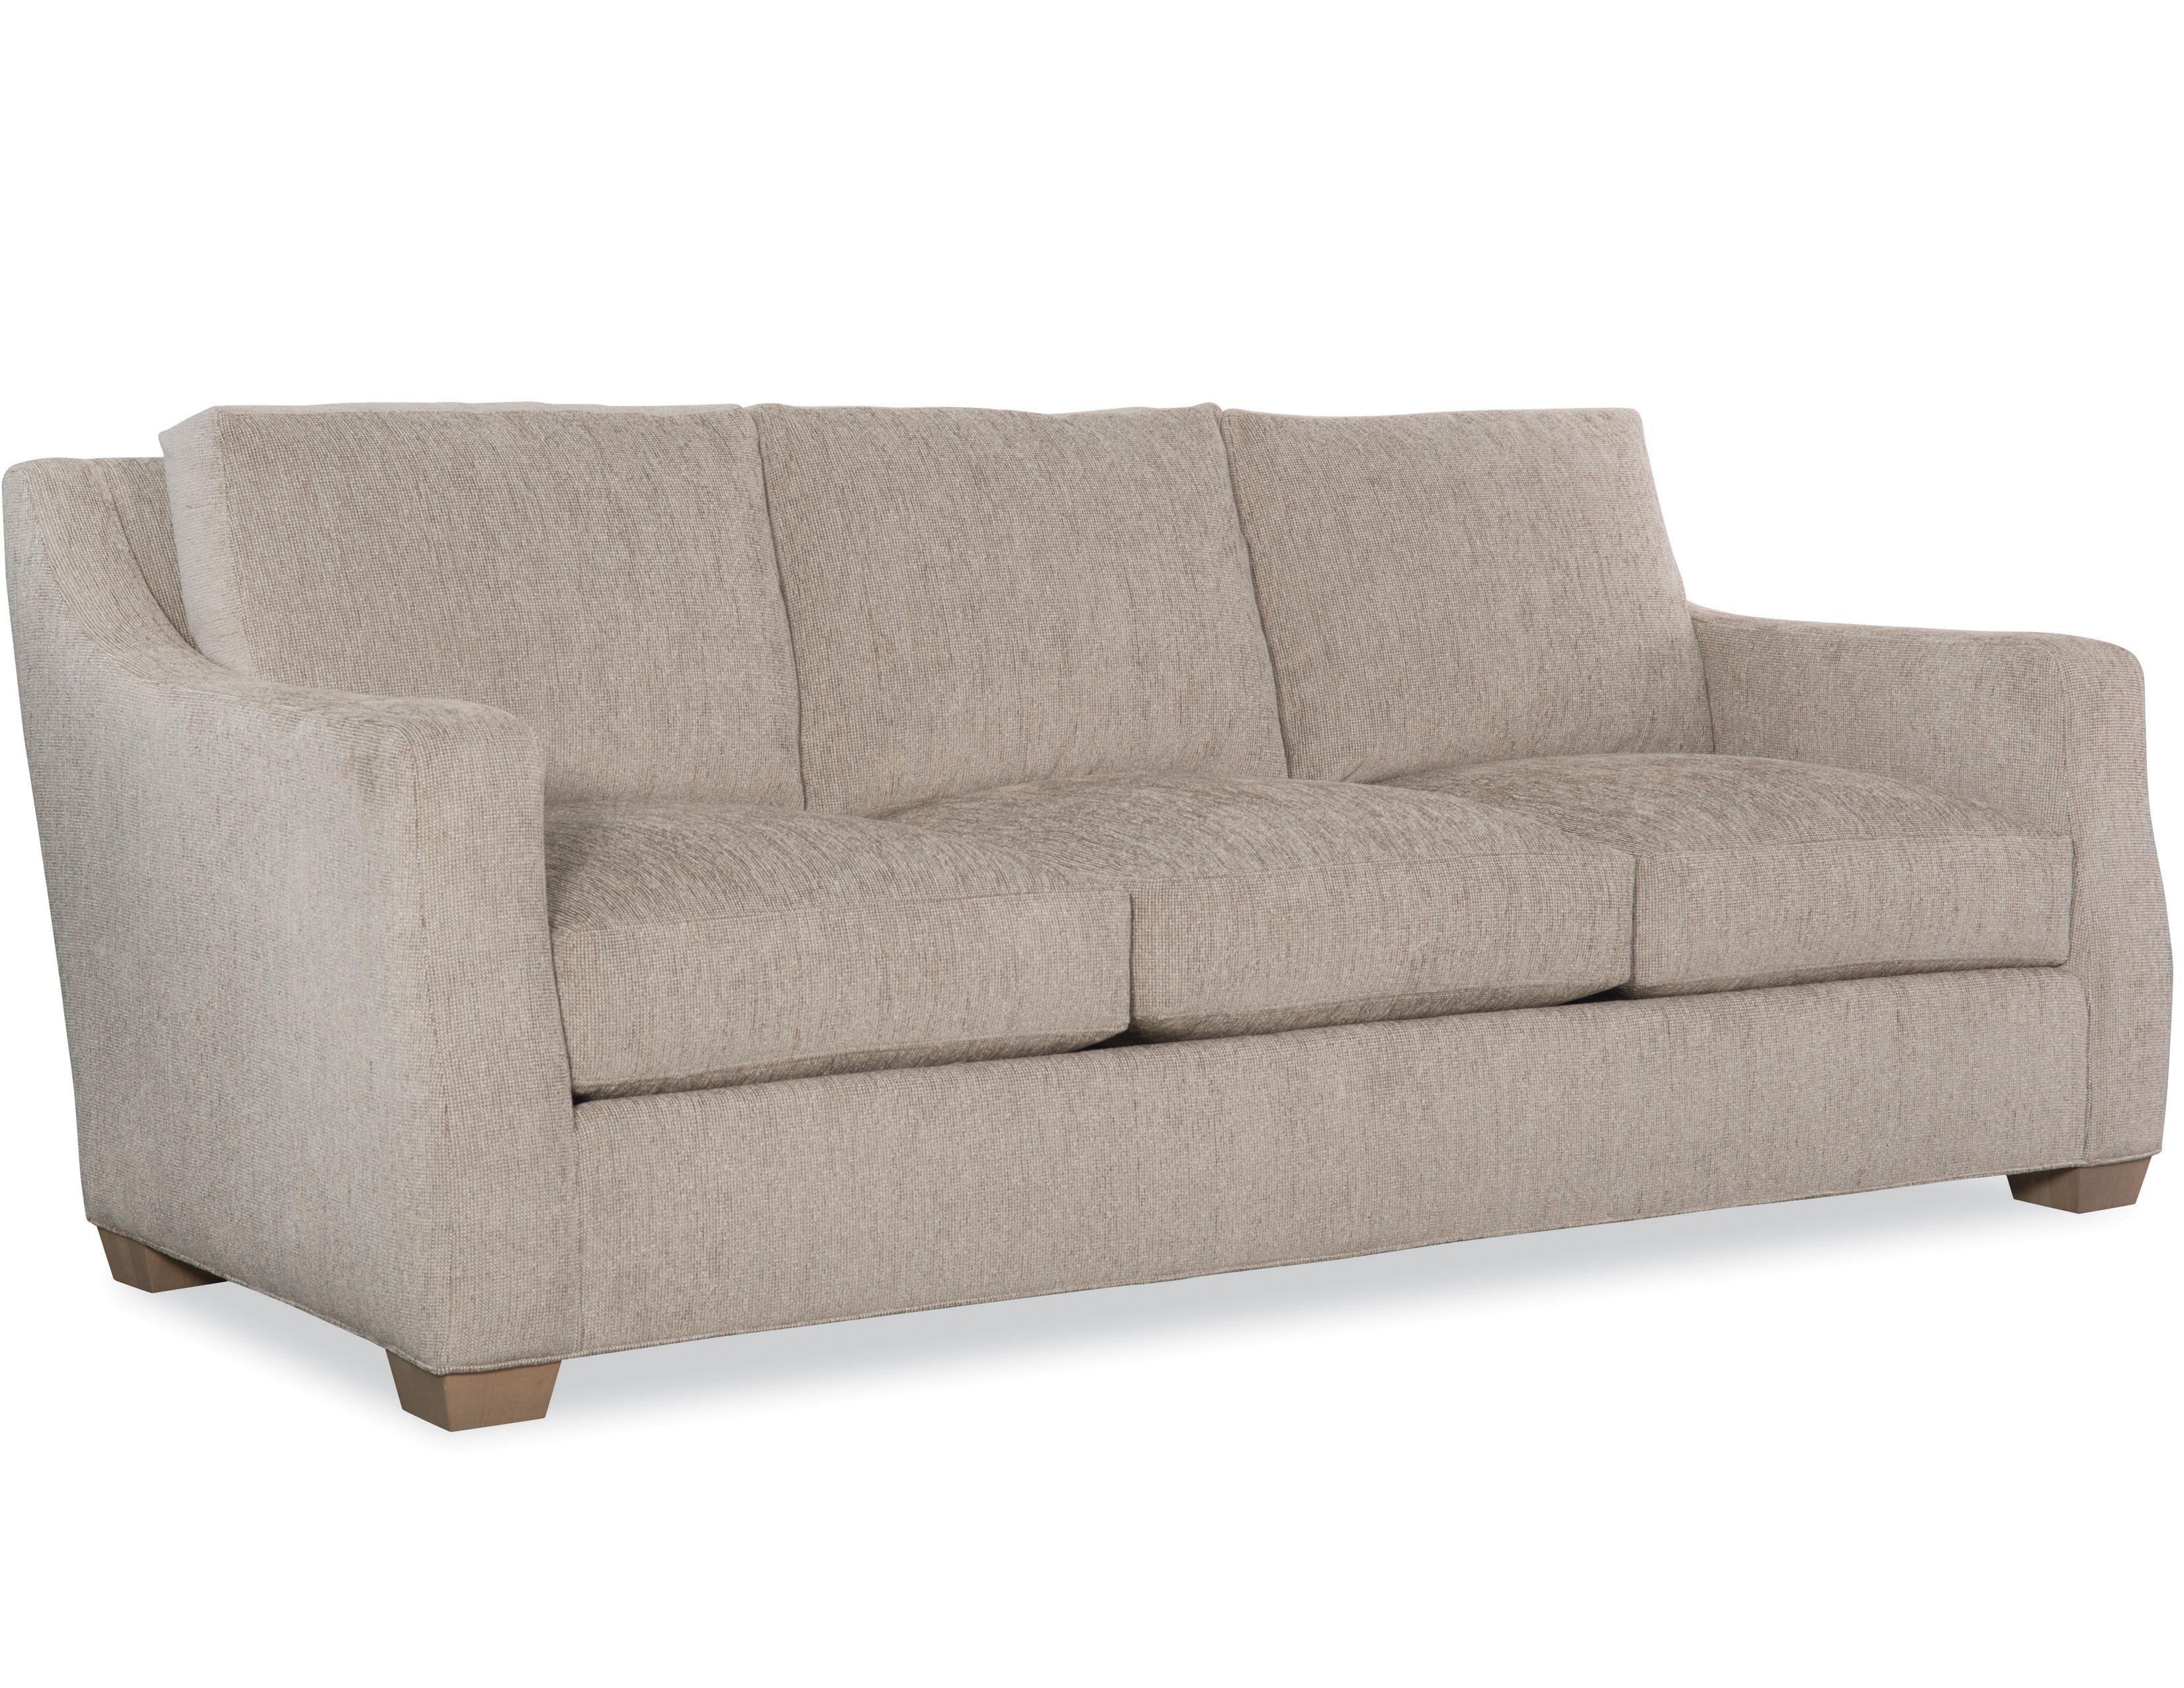 Amazing Barrett 78 90 Or 105 Sofa Sofas And Sectionals Creativecarmelina Interior Chair Design Creativecarmelinacom